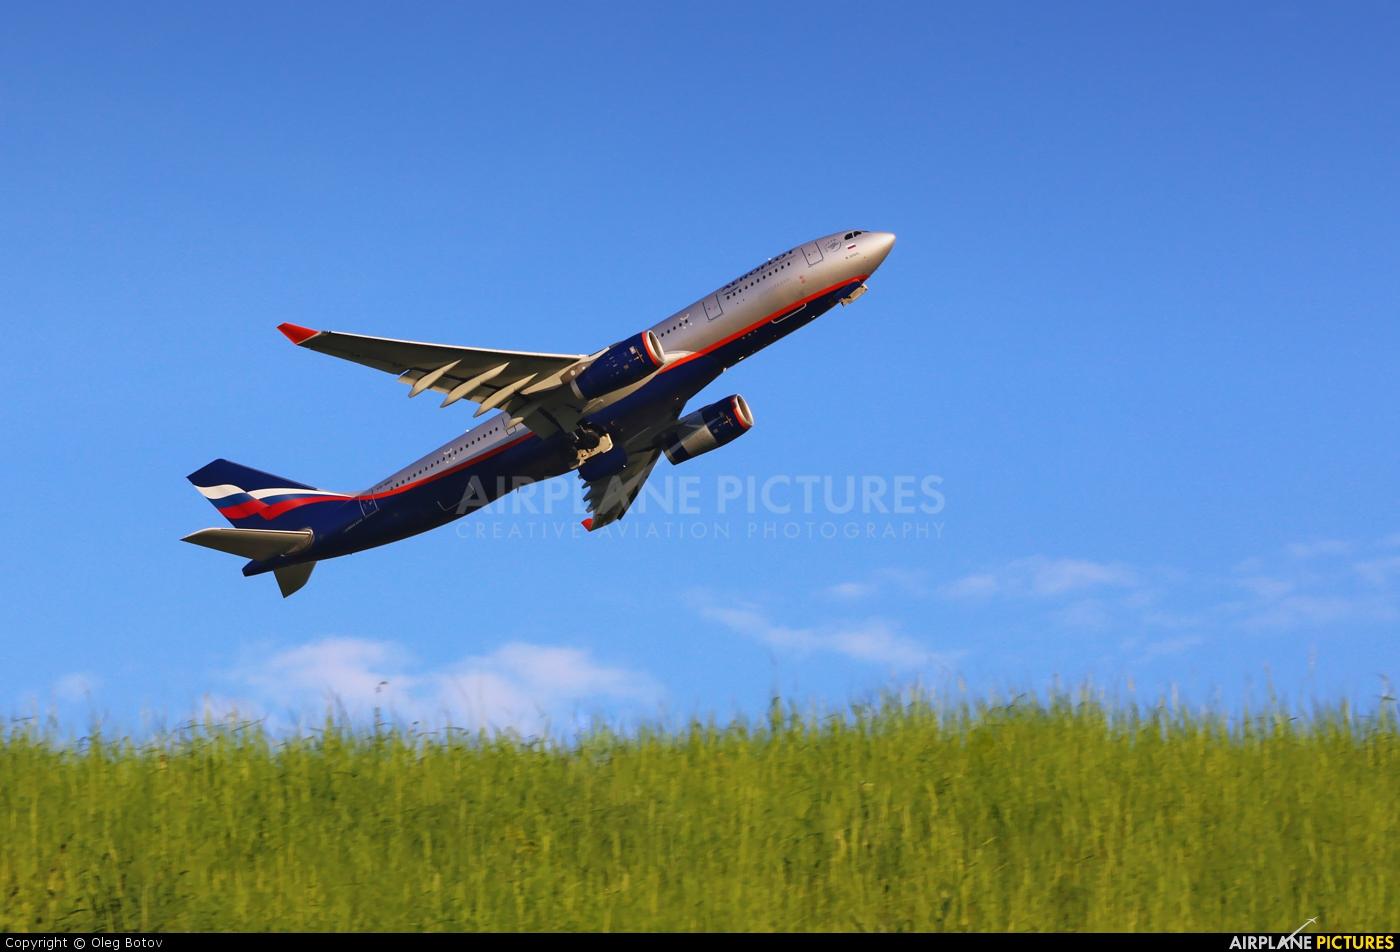 Aeroflot VQ-BBG aircraft at Moscow - Sheremetyevo